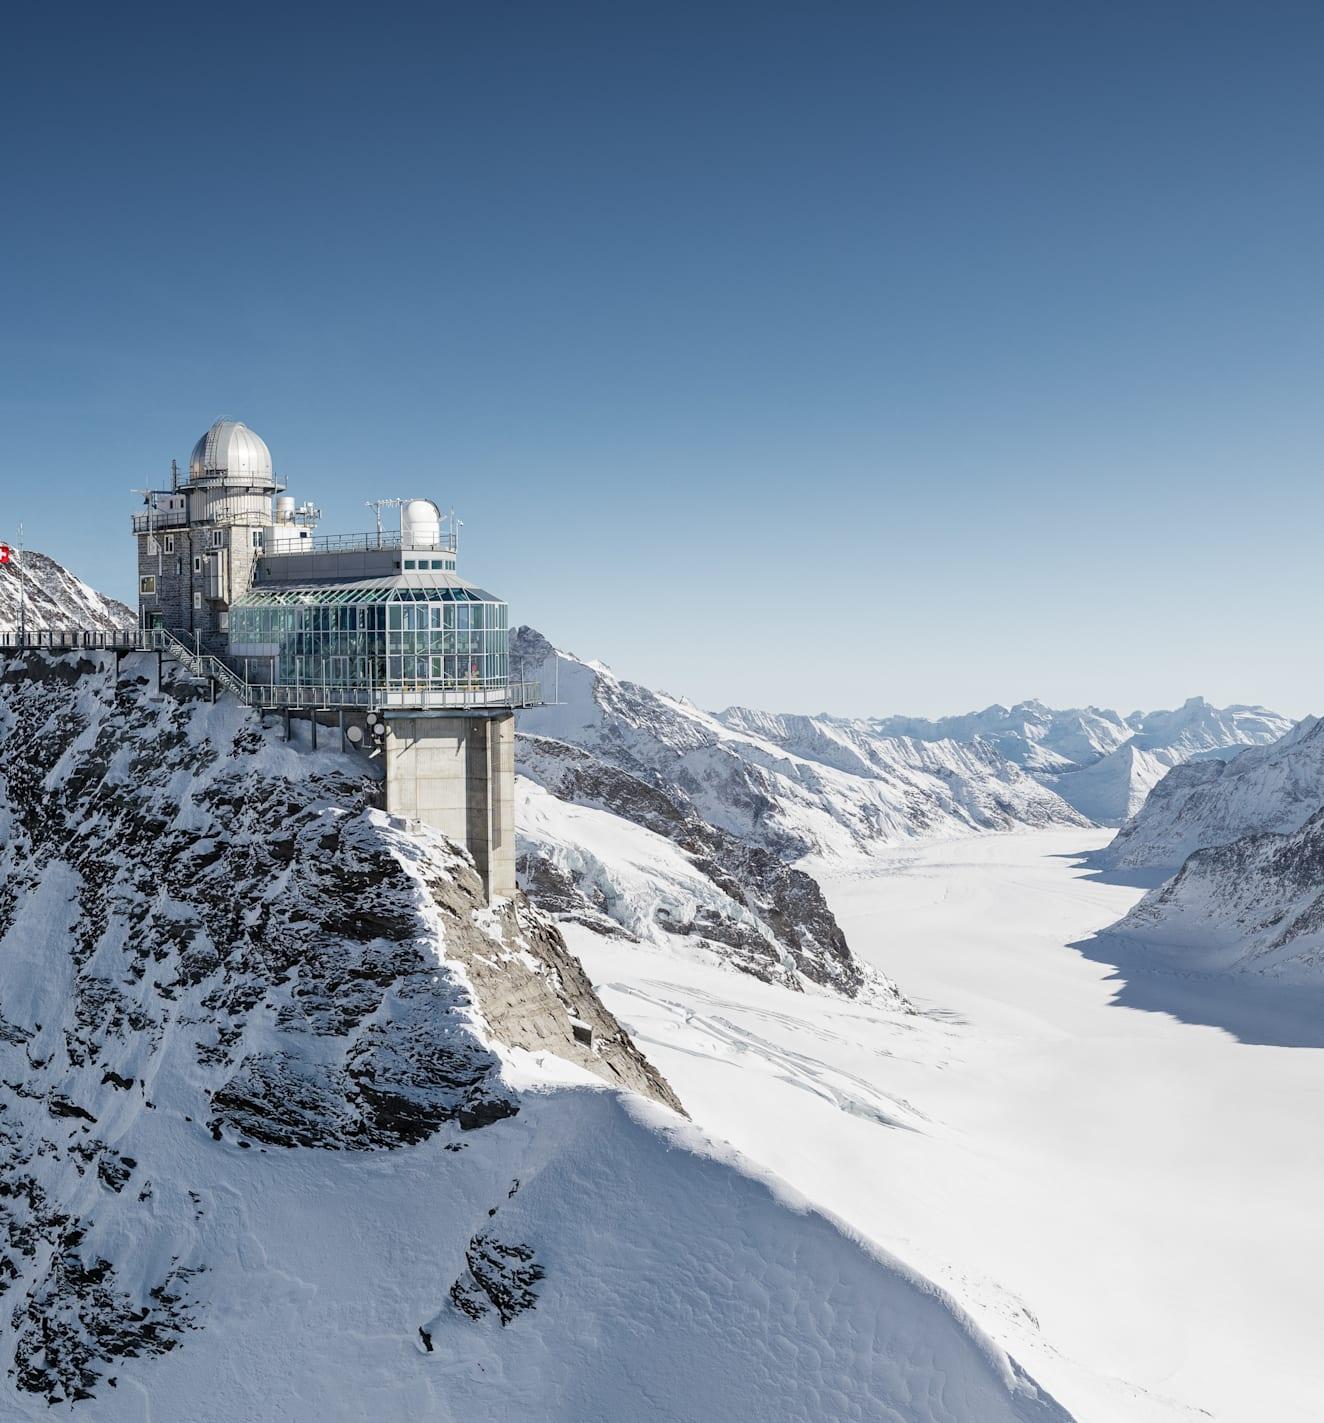 Saison, Jungfraujoch-Top-of-Europe, hiver, jungfrau.ch/fr-ch/